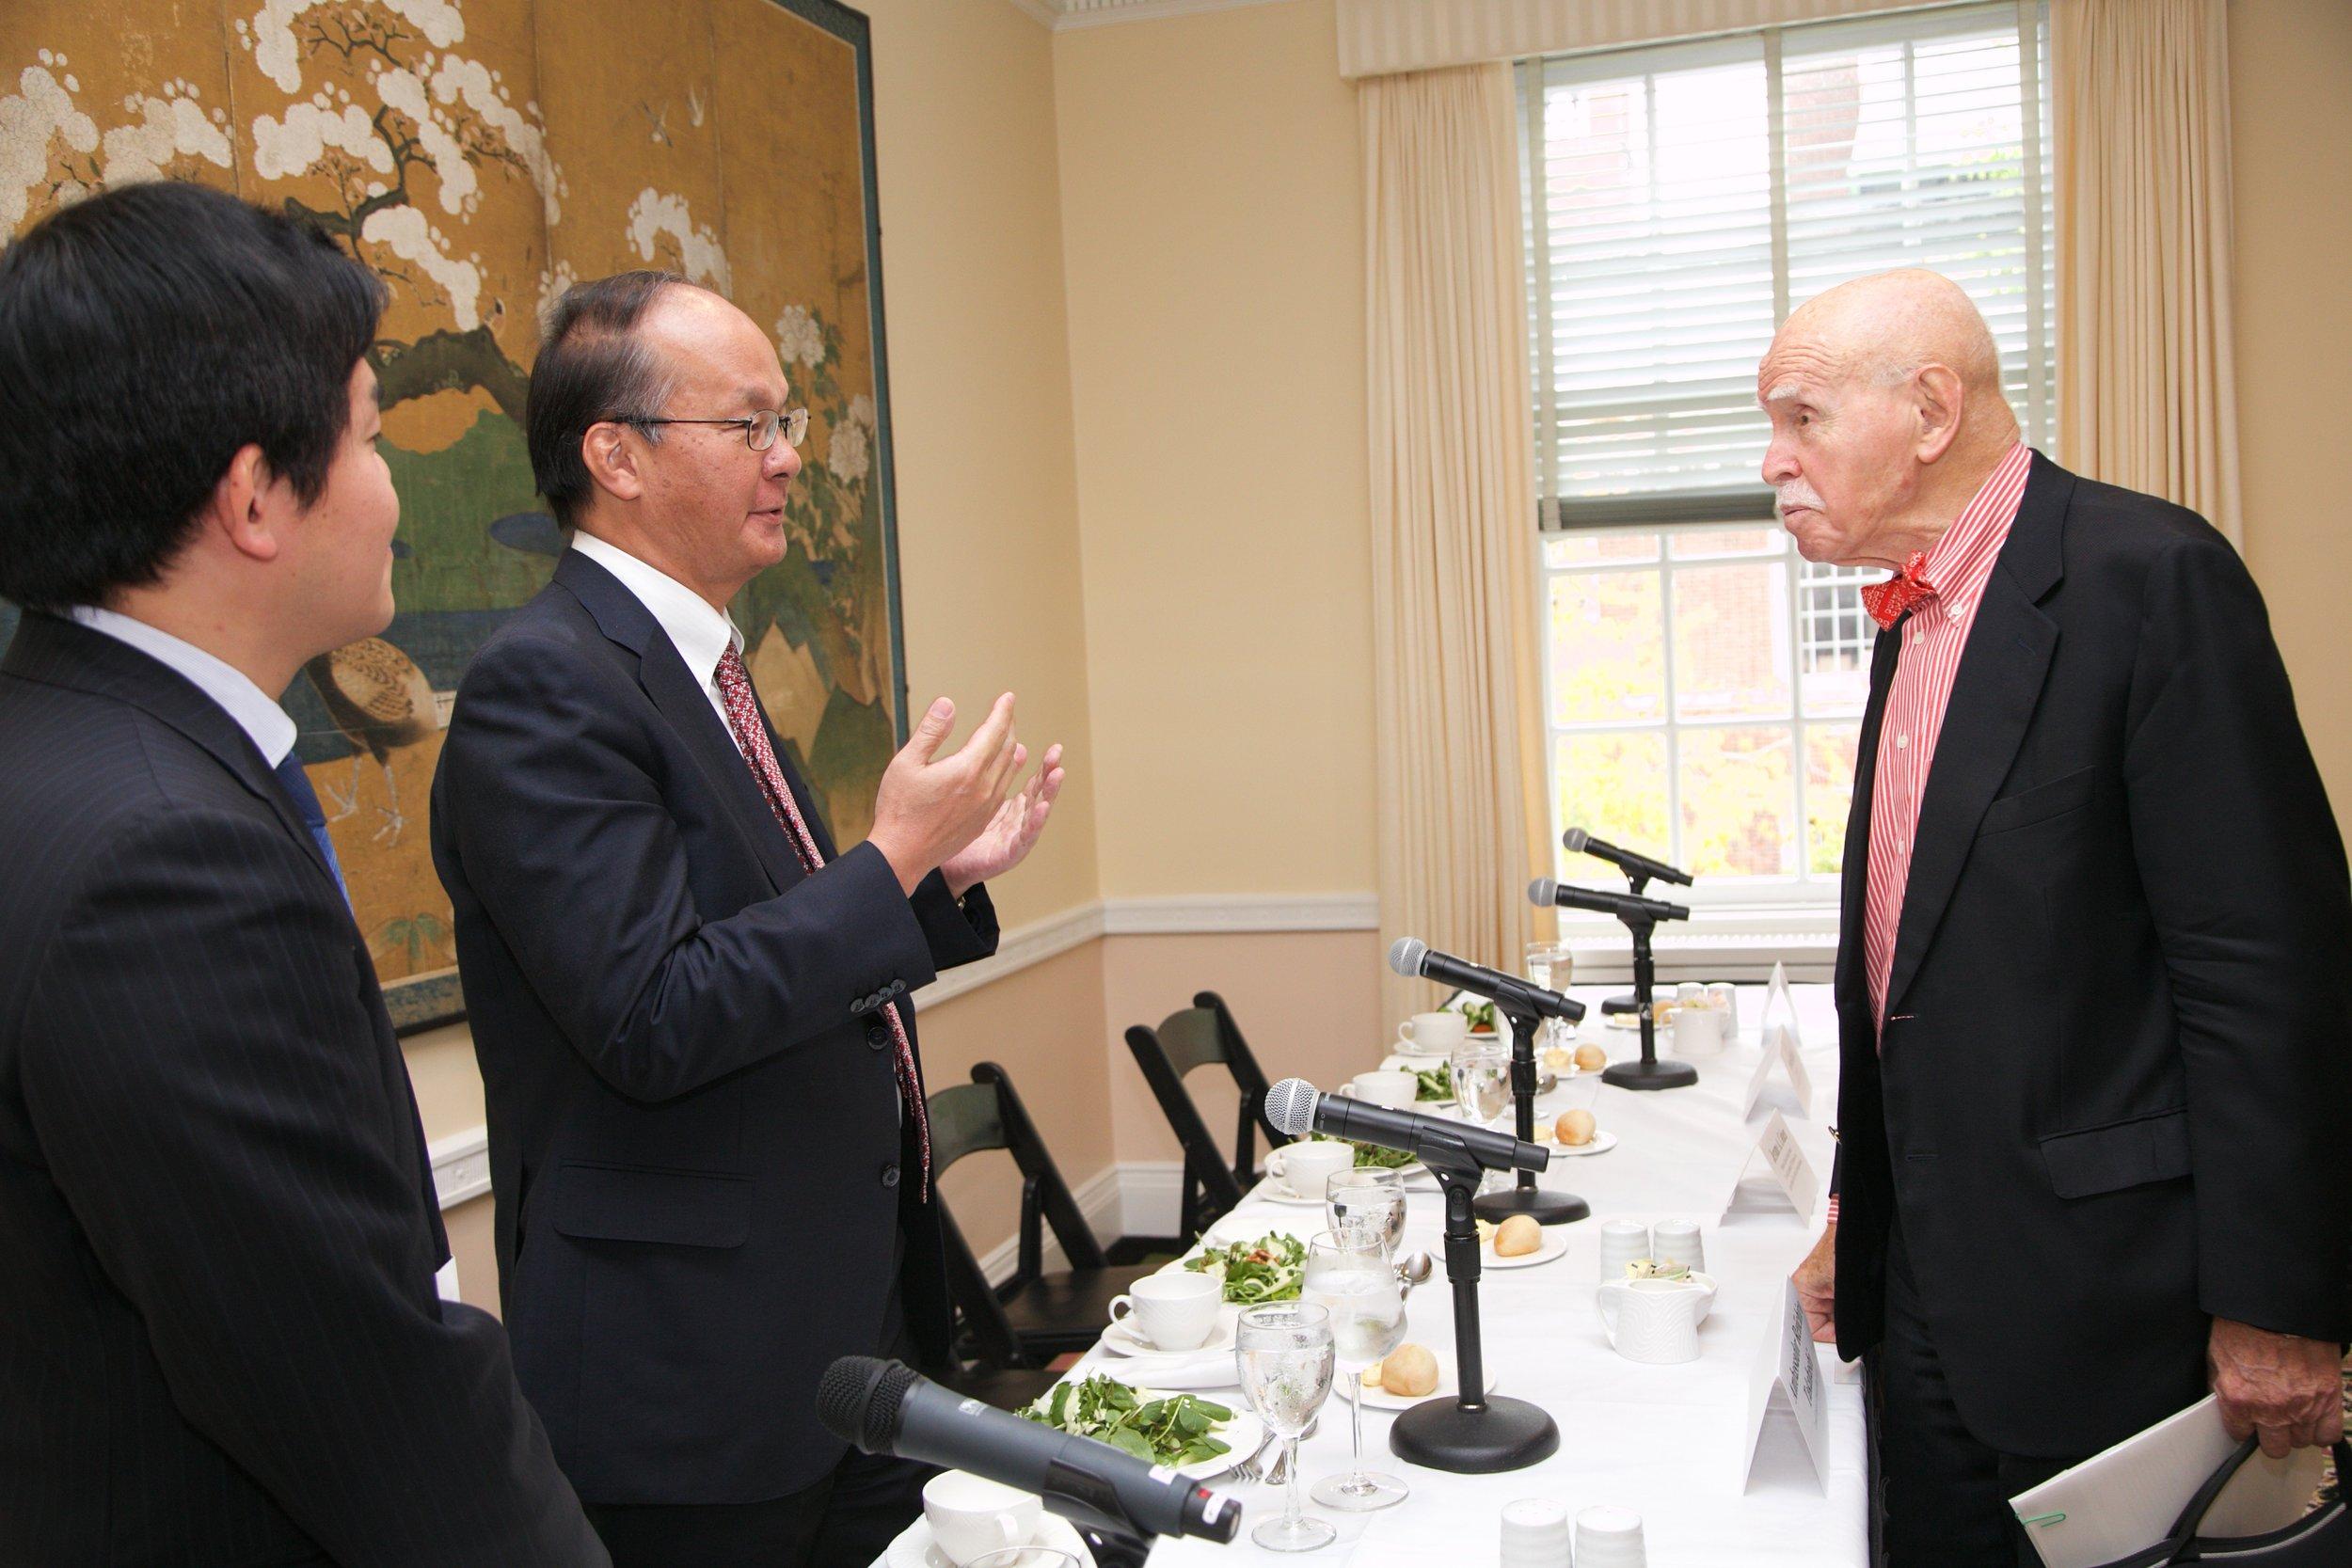 Senior Fellow Ren Ito, Ambassador Reiichiro Takahashi, and Professor Jerome A. Cohen at lunch